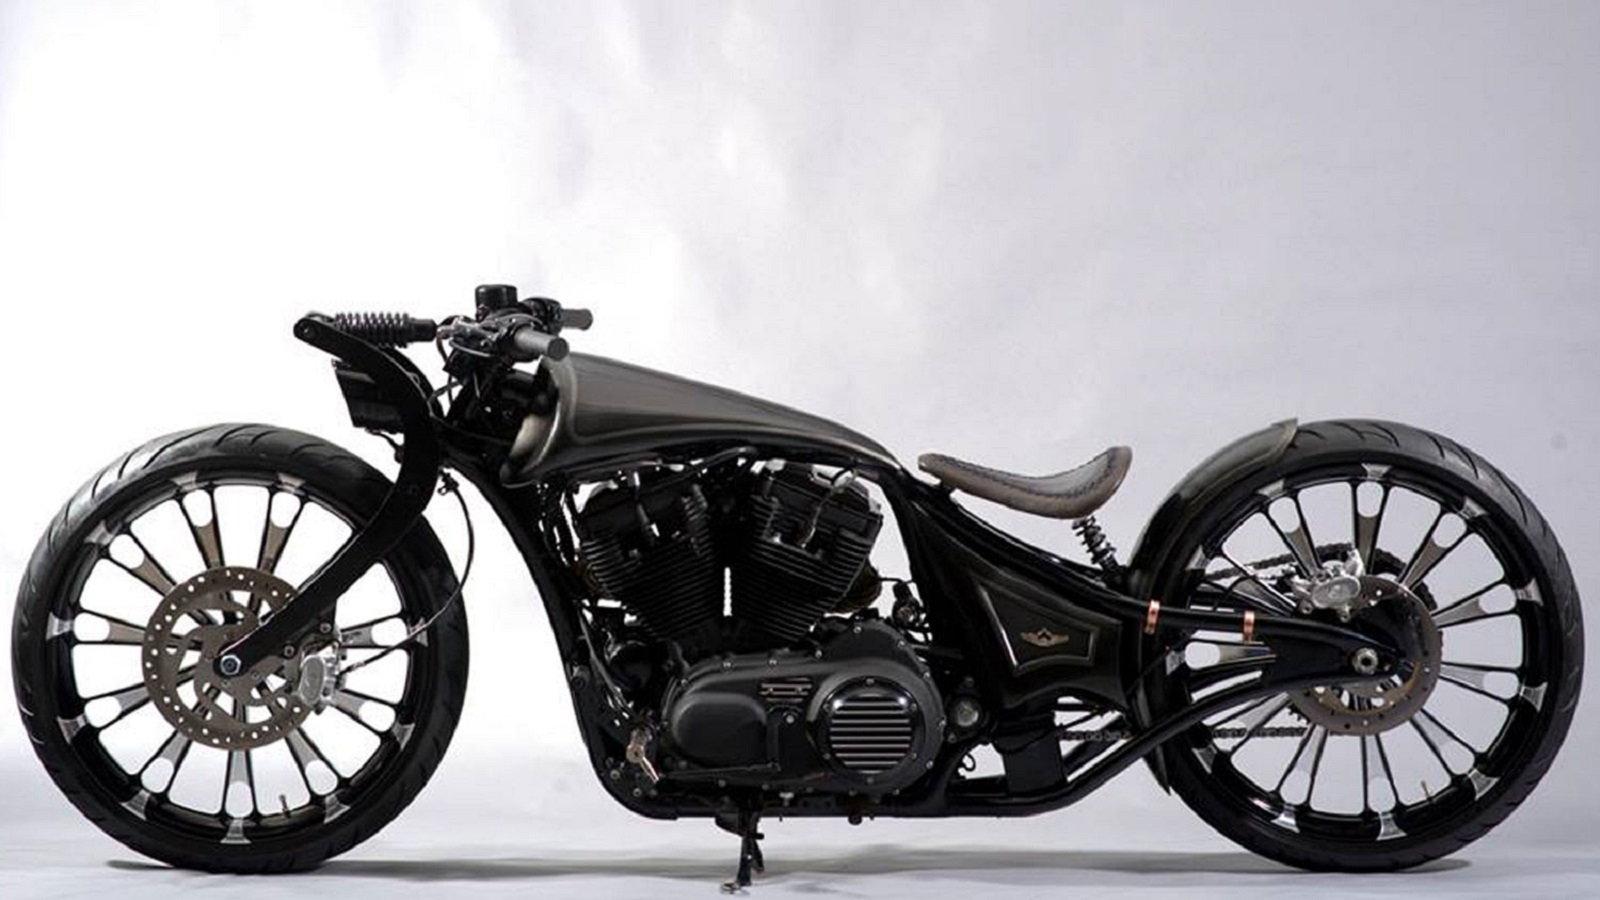 Indian-Built Custom Iron 883 Looks like the Future